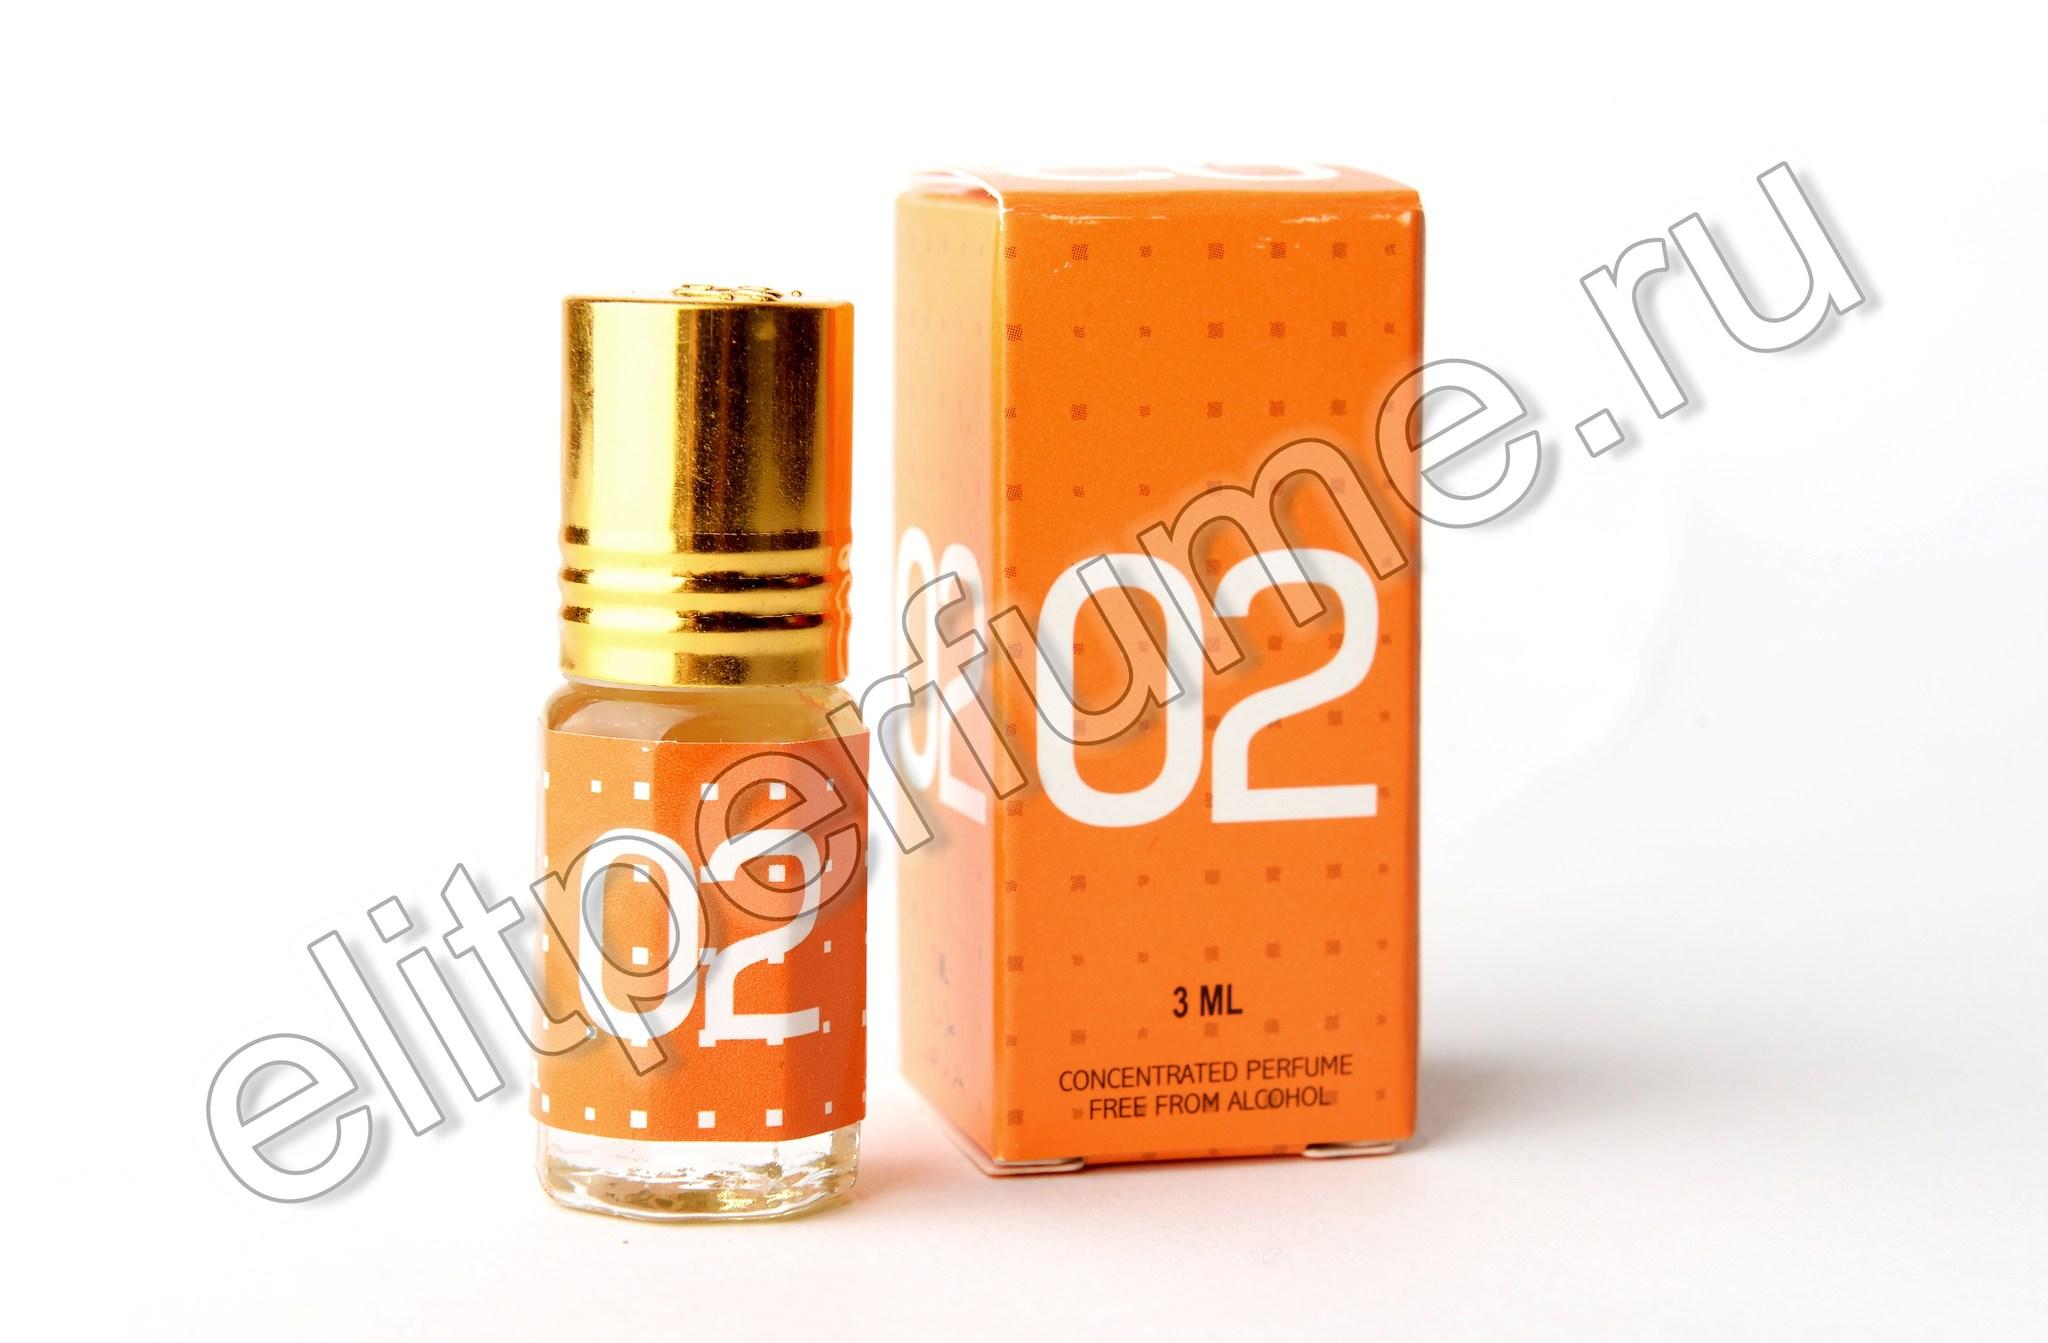 02 Molecule 3 мл арабские масляные духи от Захра Zahra Perfumes